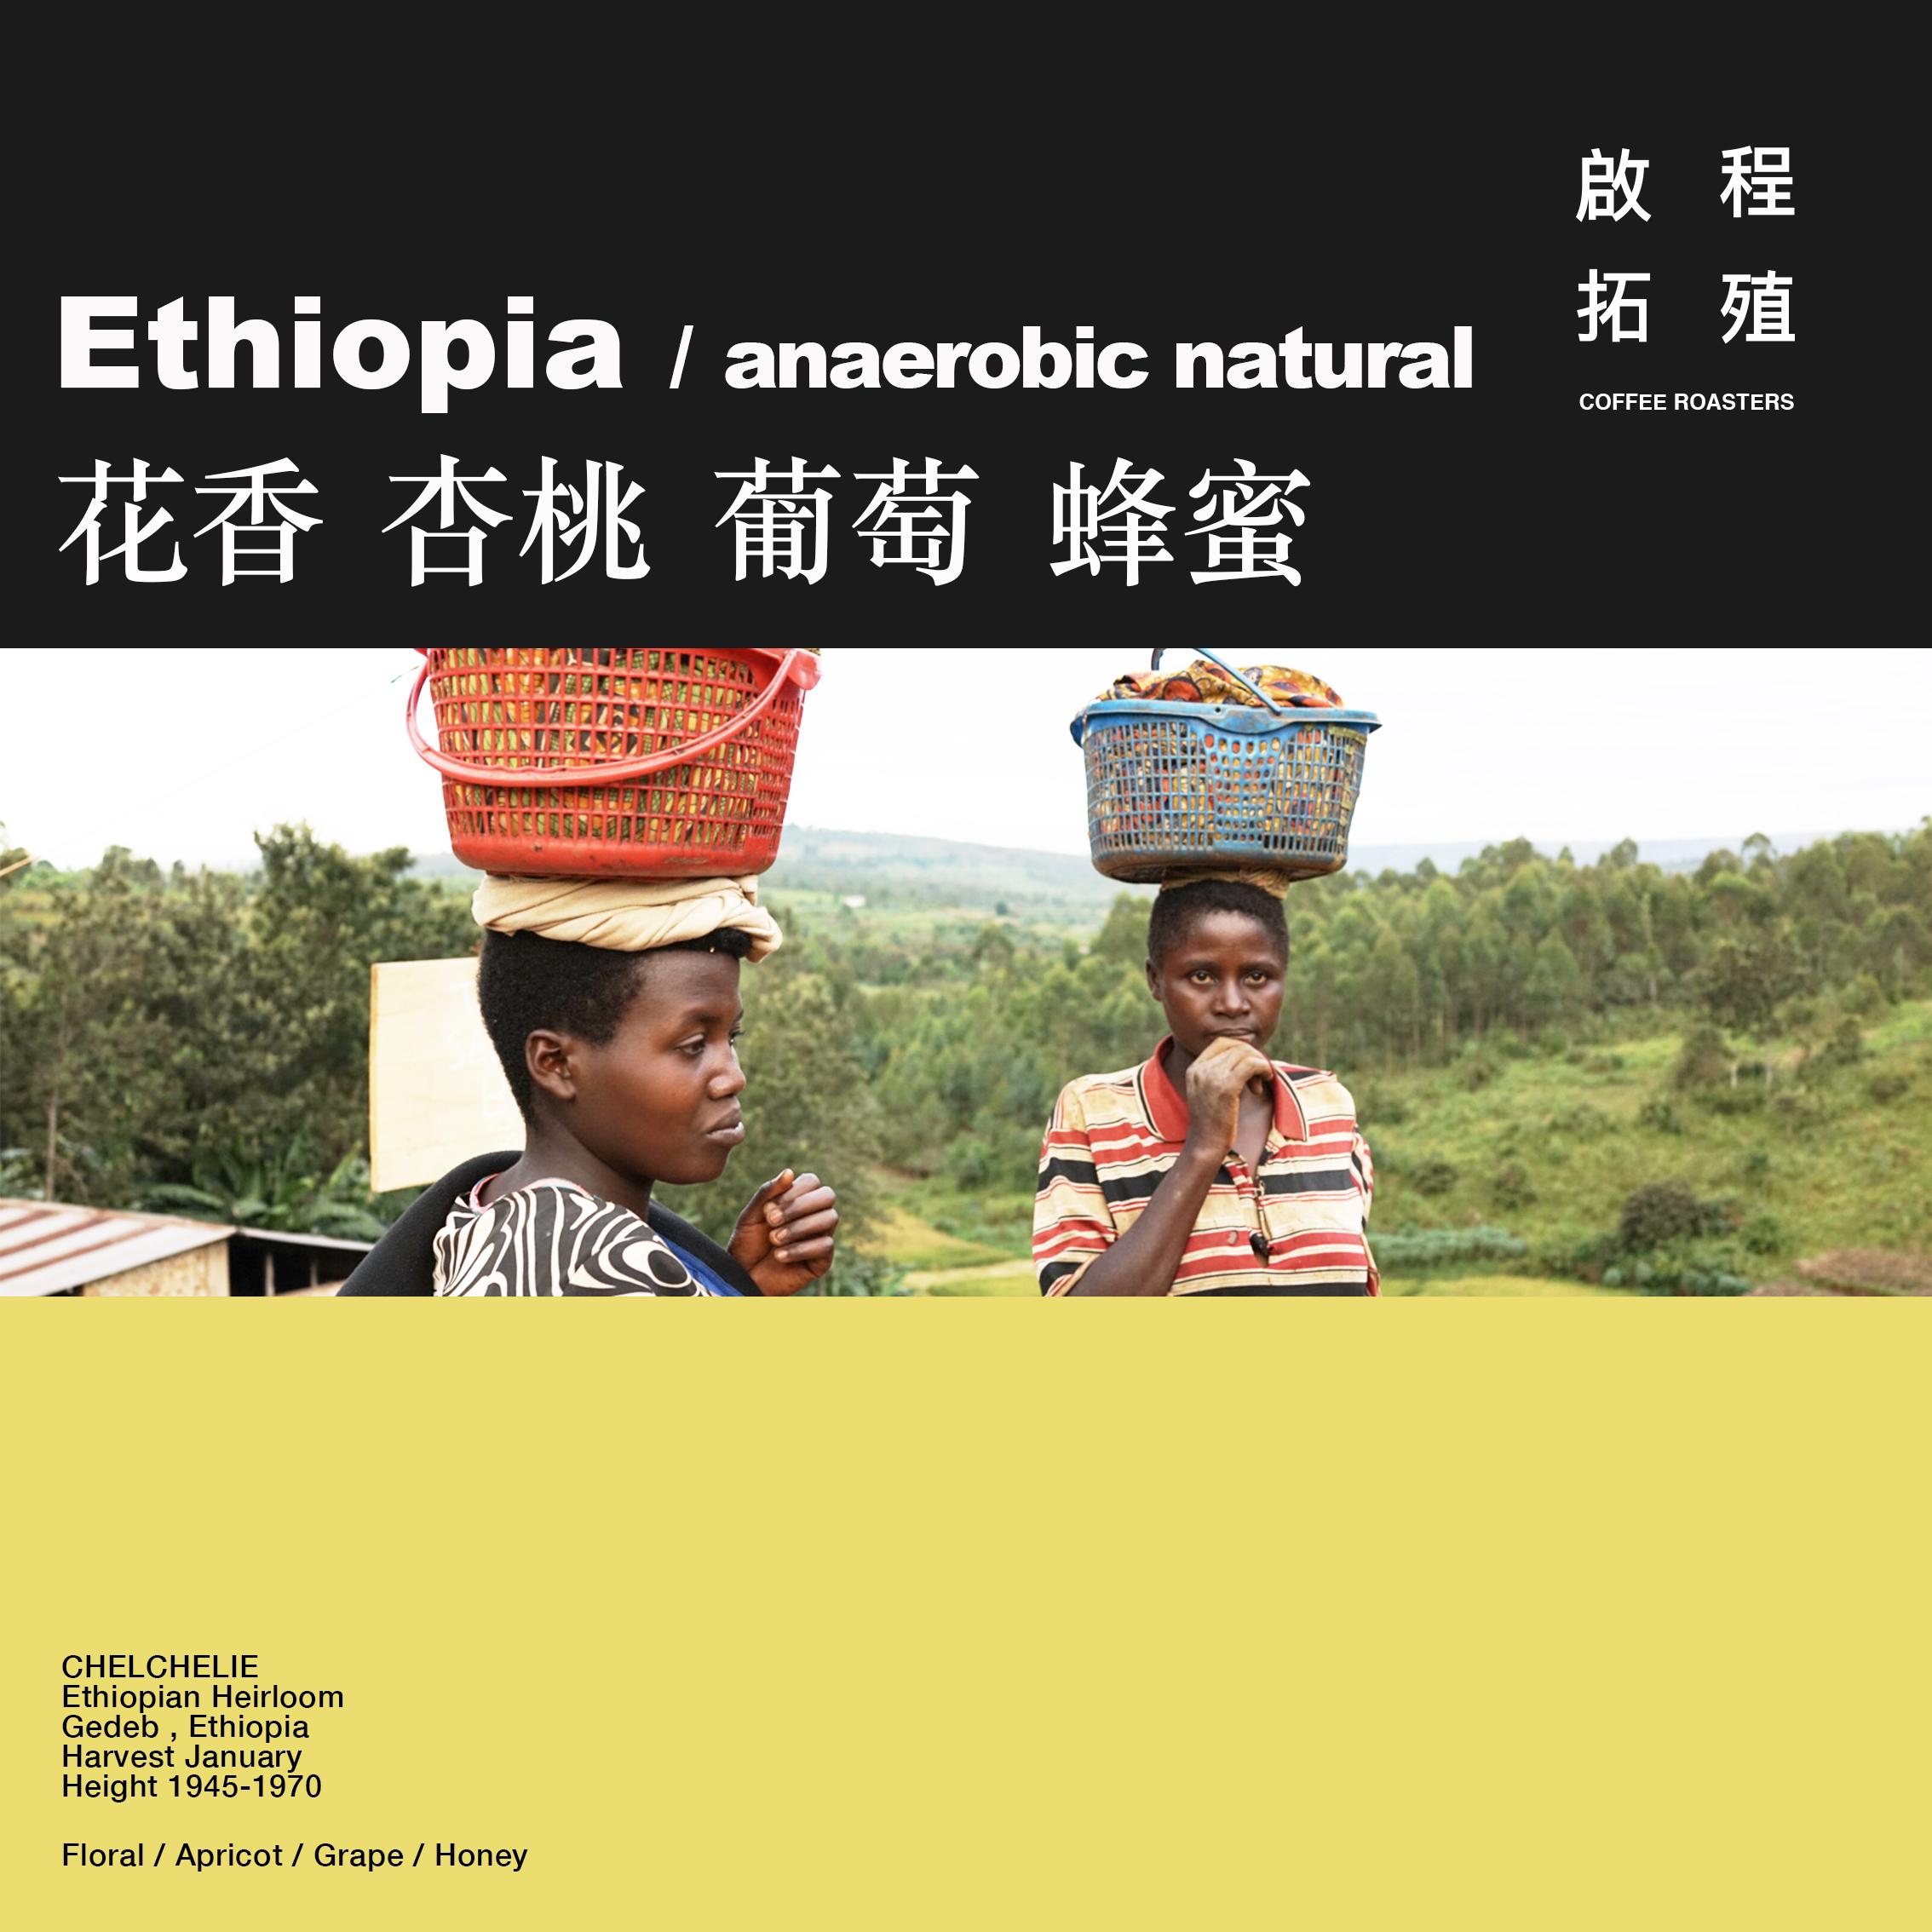 【Terraform】杏桃葡萄 2020新产季埃塞俄比亚96h厌氧日晒咖啡豆